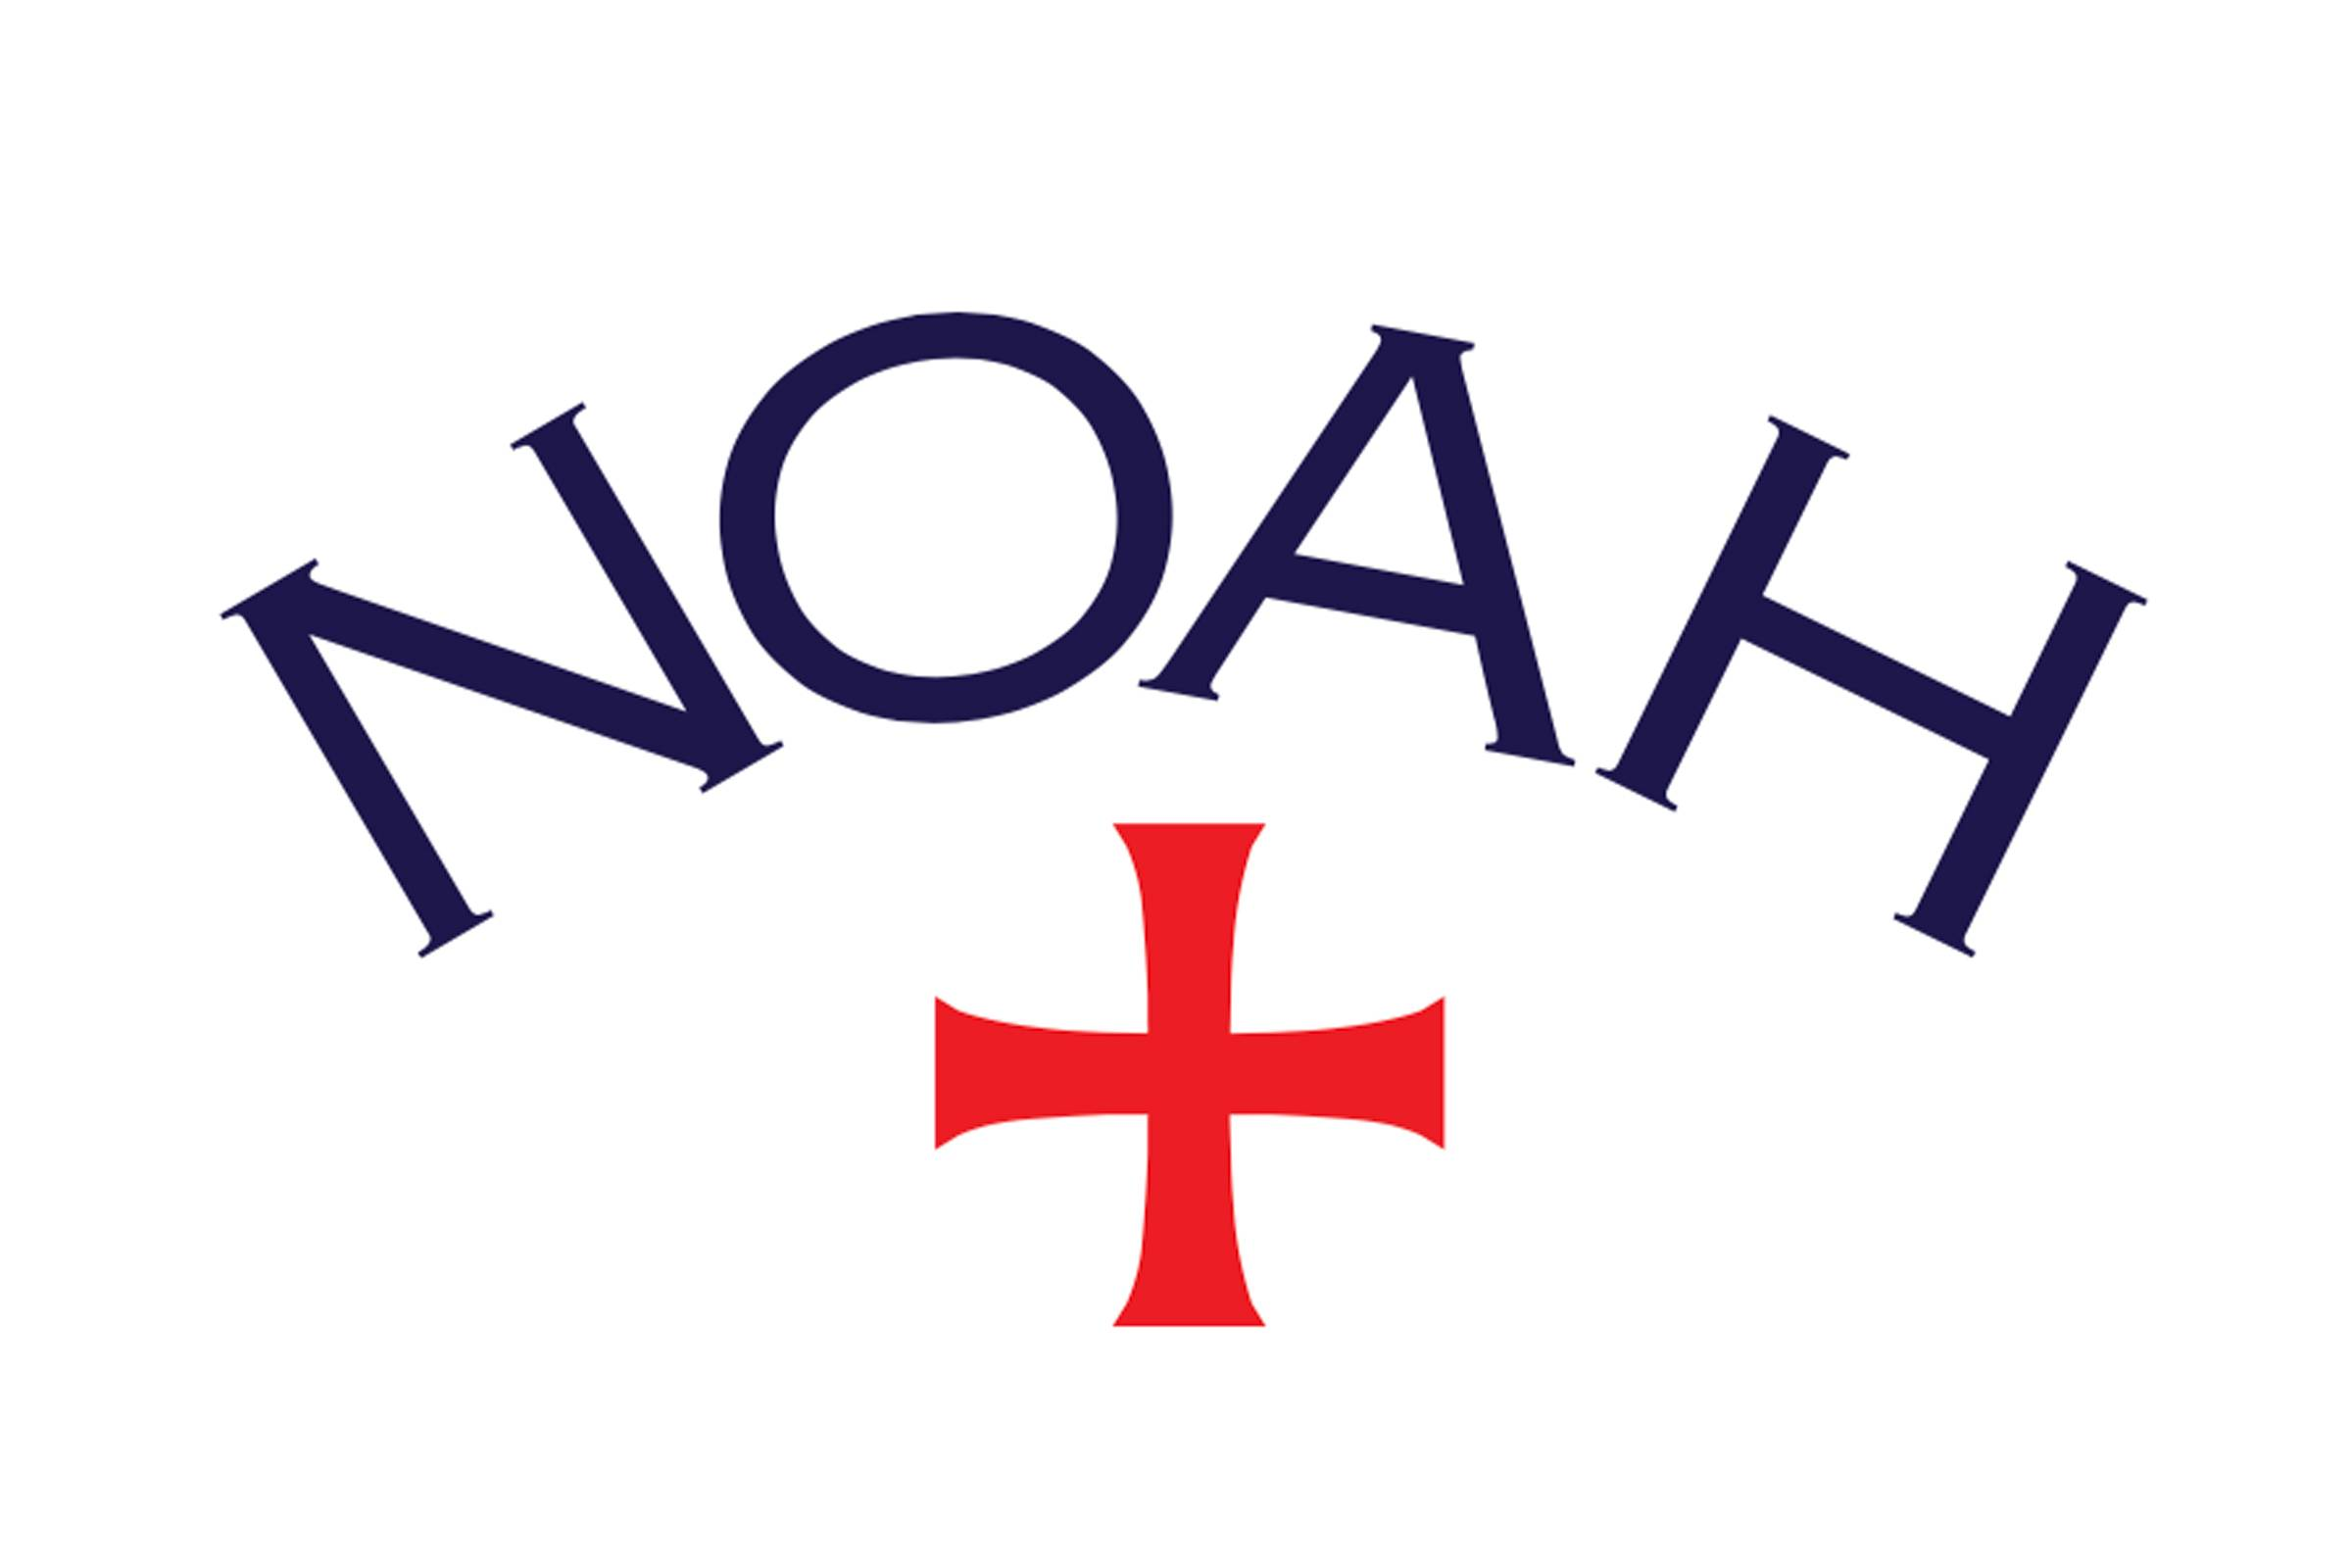 Preppy Clothing Brands: Noah